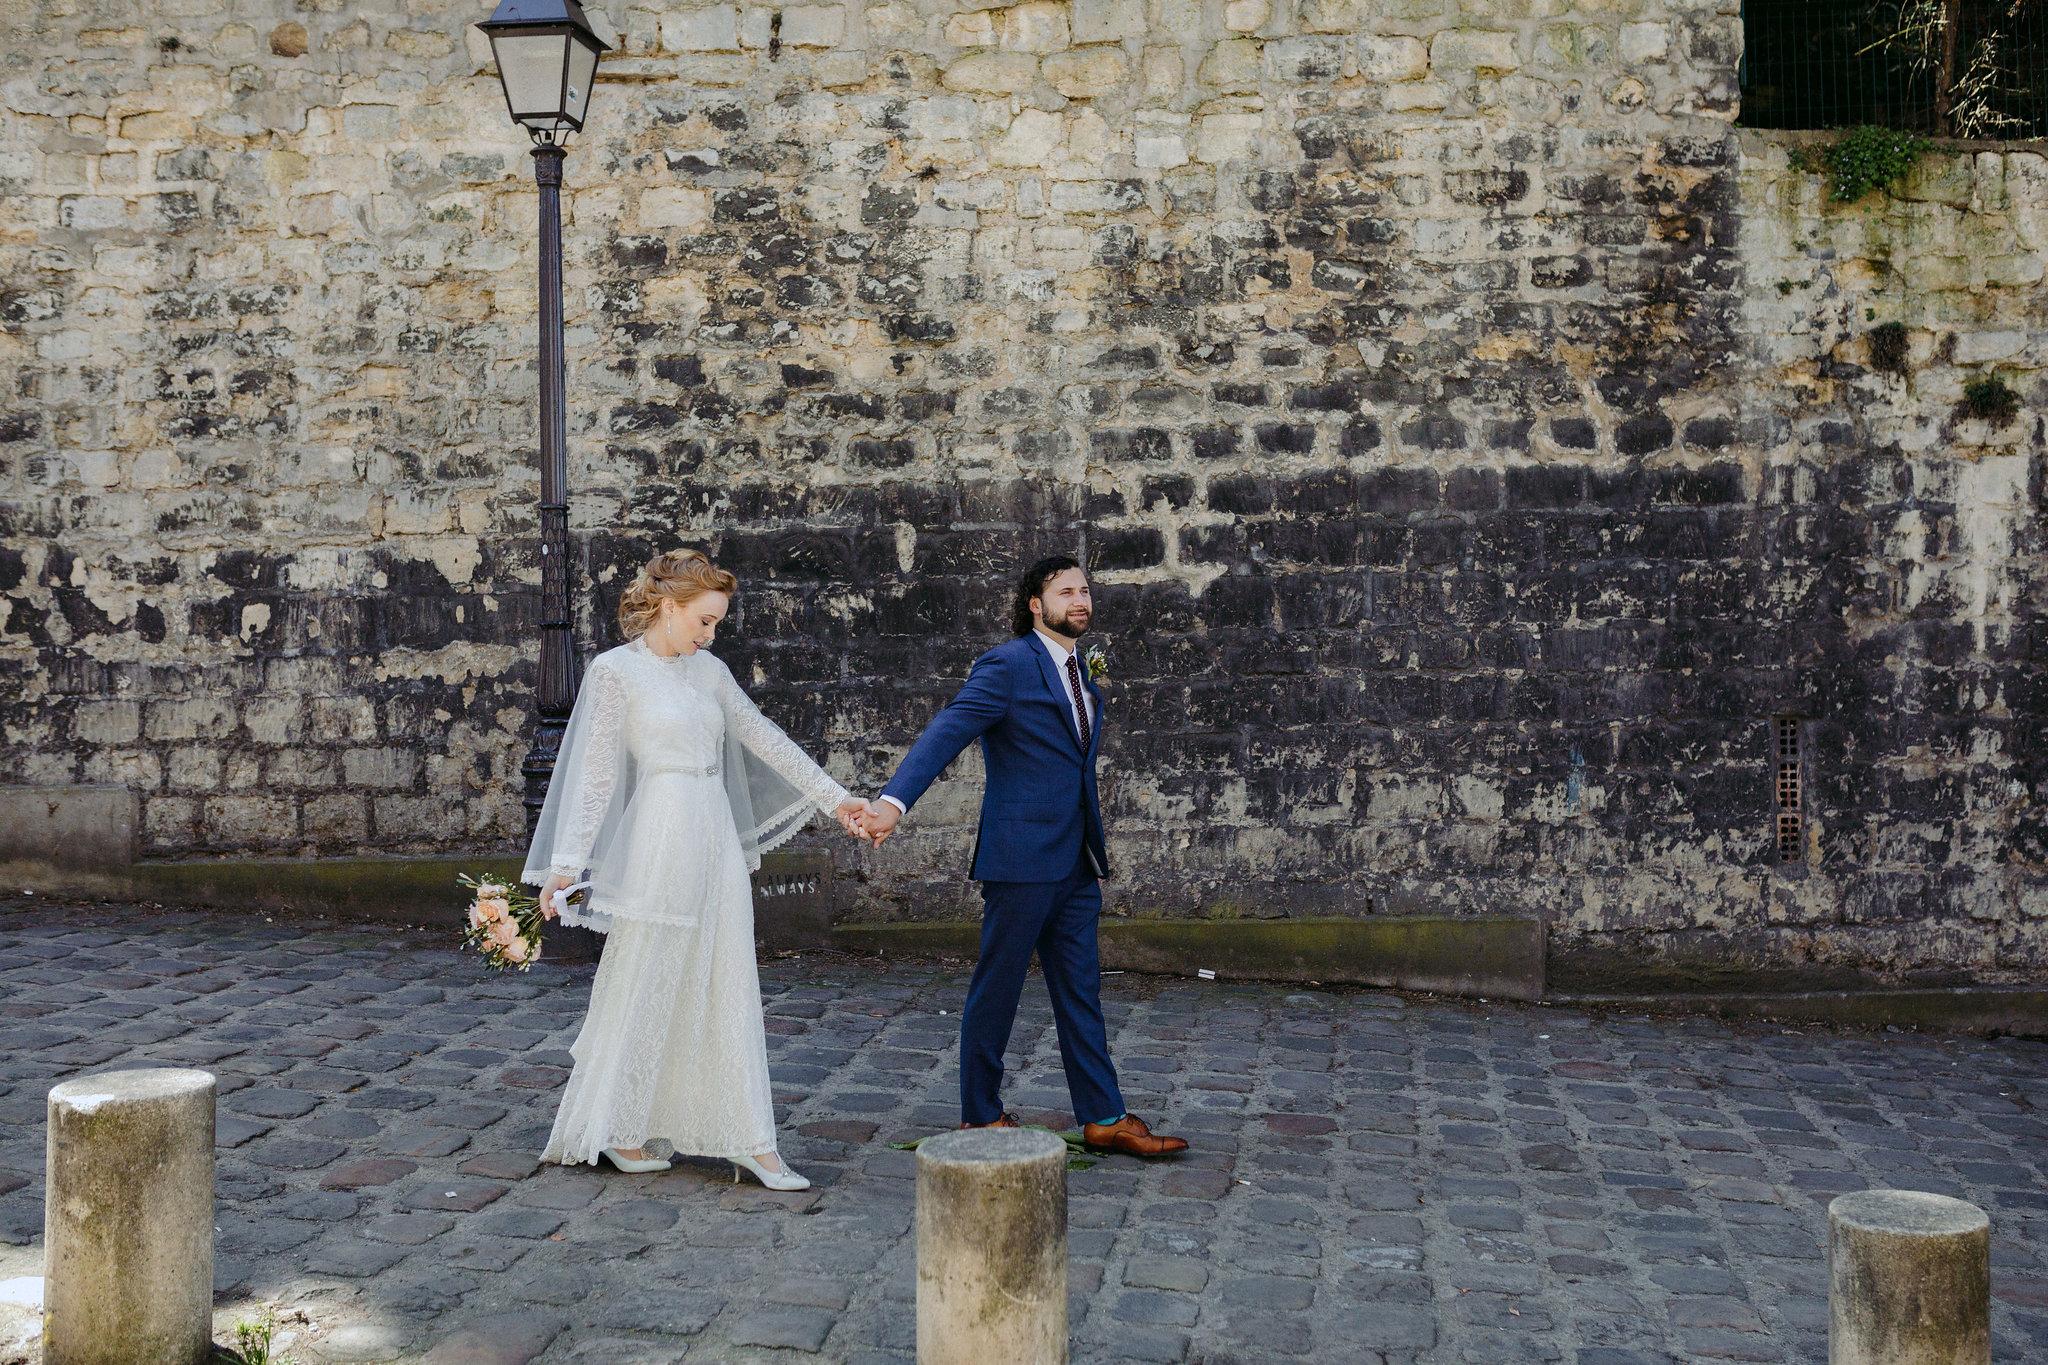 Paris_elopement_wedding_photographer-314.jpg